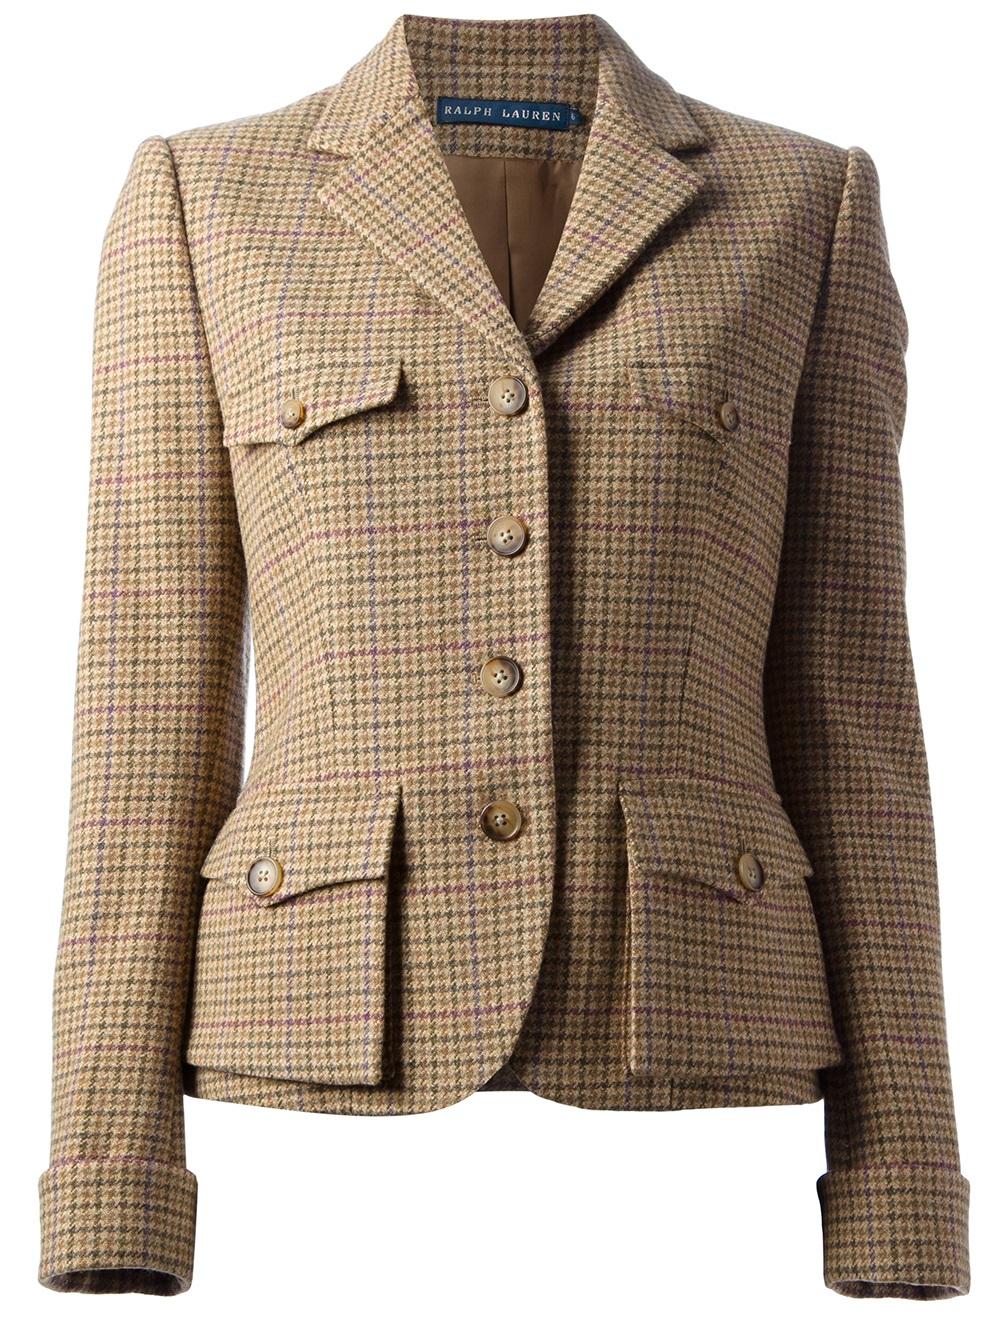 Shop Ralph Lauren Womens Black Zip Up Jacket Size: M